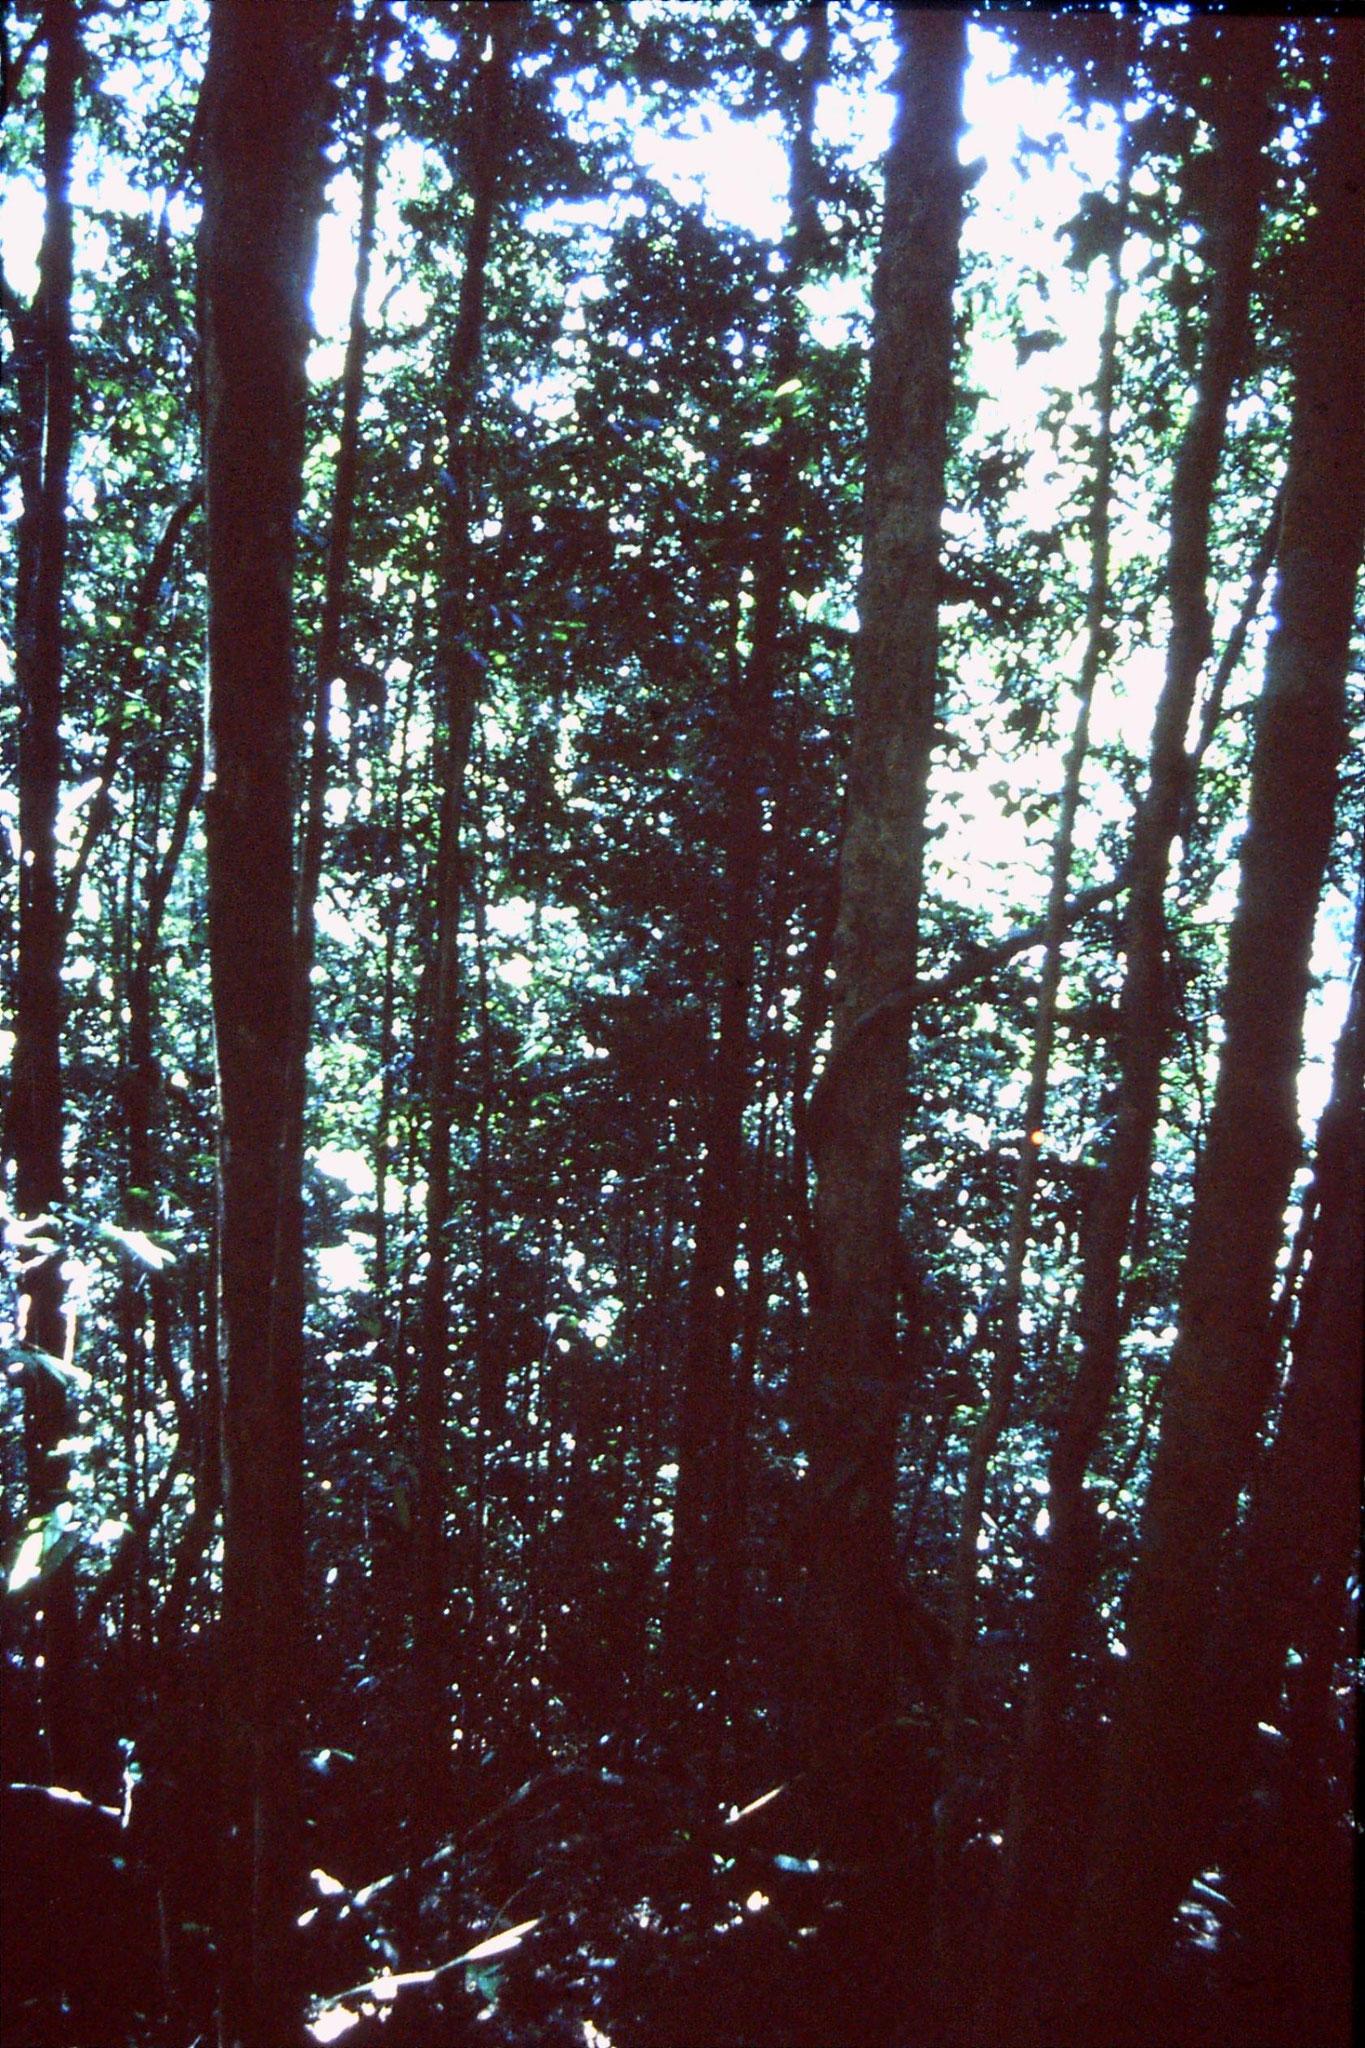 30/1/1990: 9: Sinharaja forest